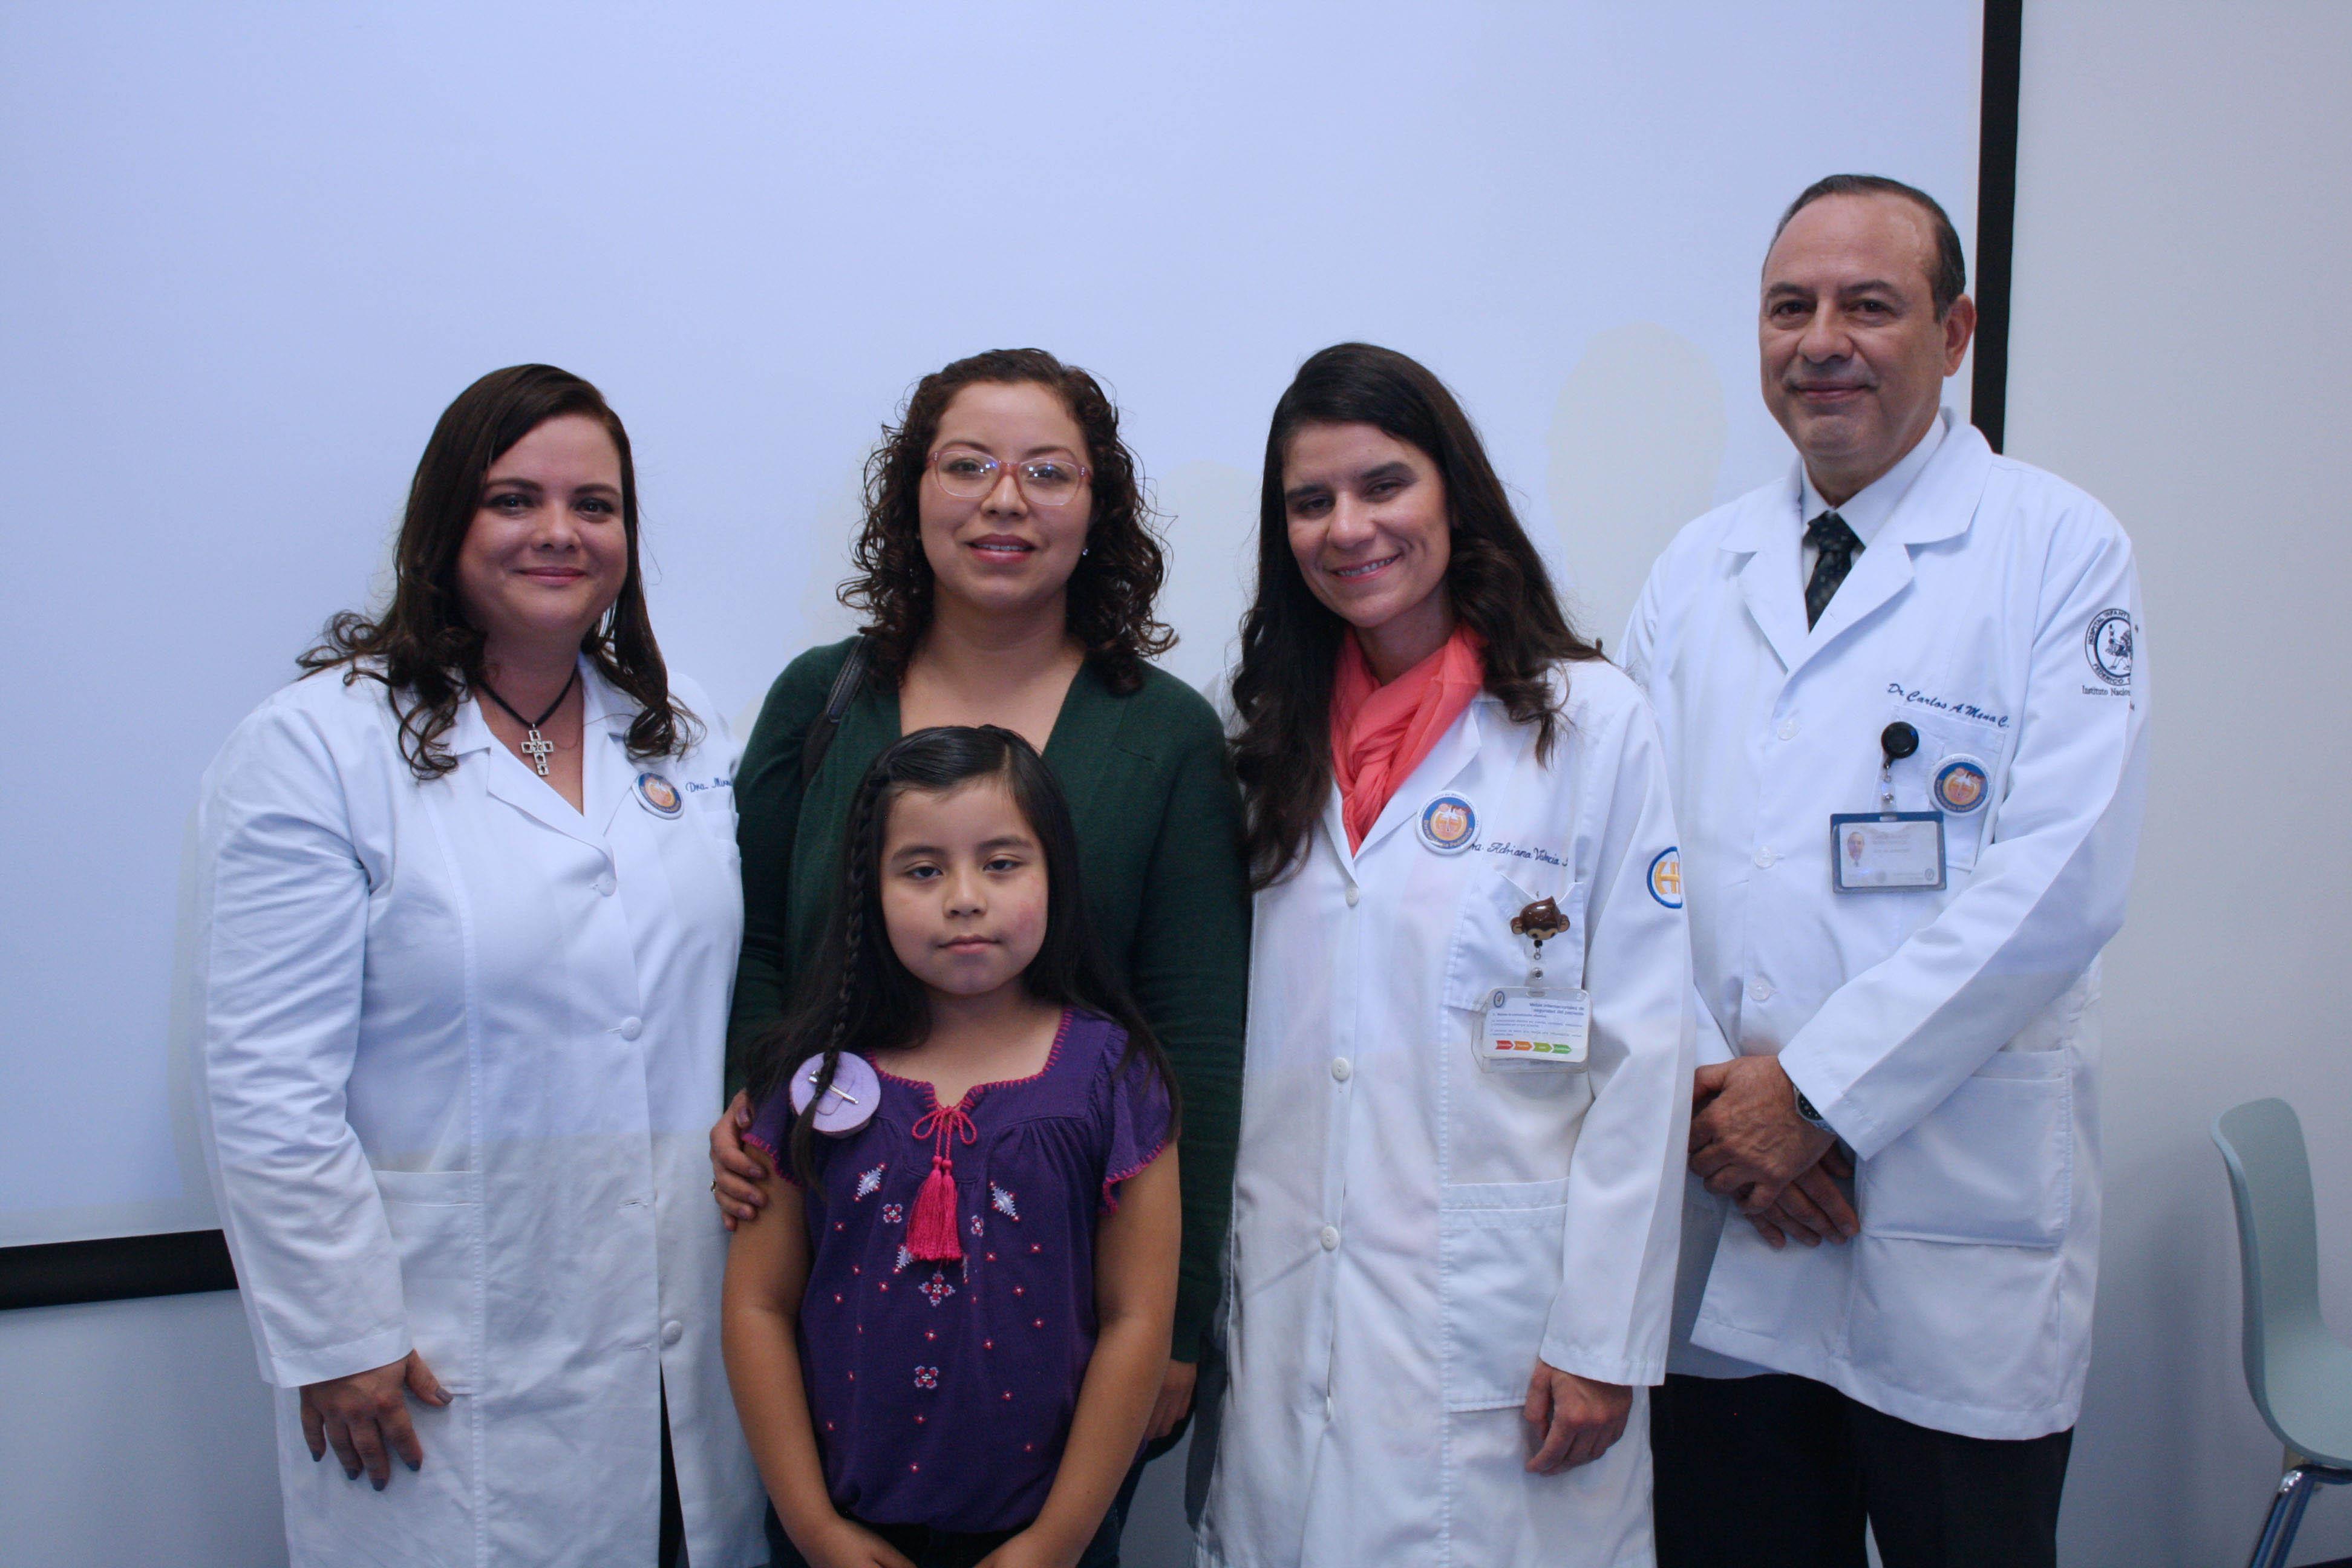 Dr Mena  Dra Toledo  Dra Valencia  Mam  y paciente jpg